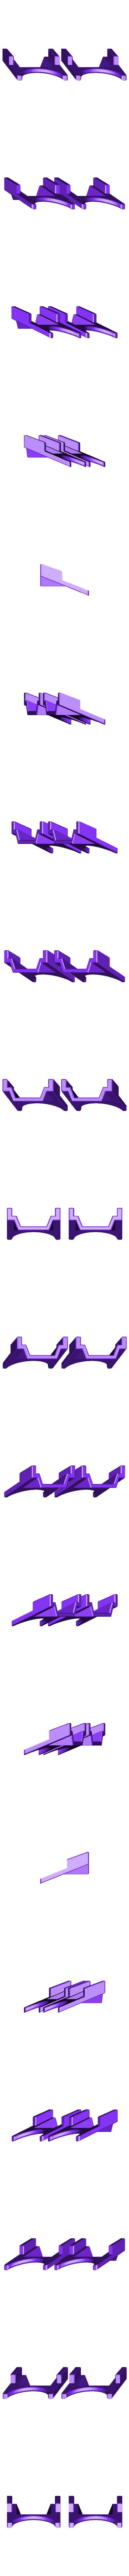 63_Drag_Leg13_ShinFront_BLACK.stl Download STL file ARTICULATED DRAGONLORD (not Dragonzord) - NO SUPPORT • 3D printer model, Toymakr3D